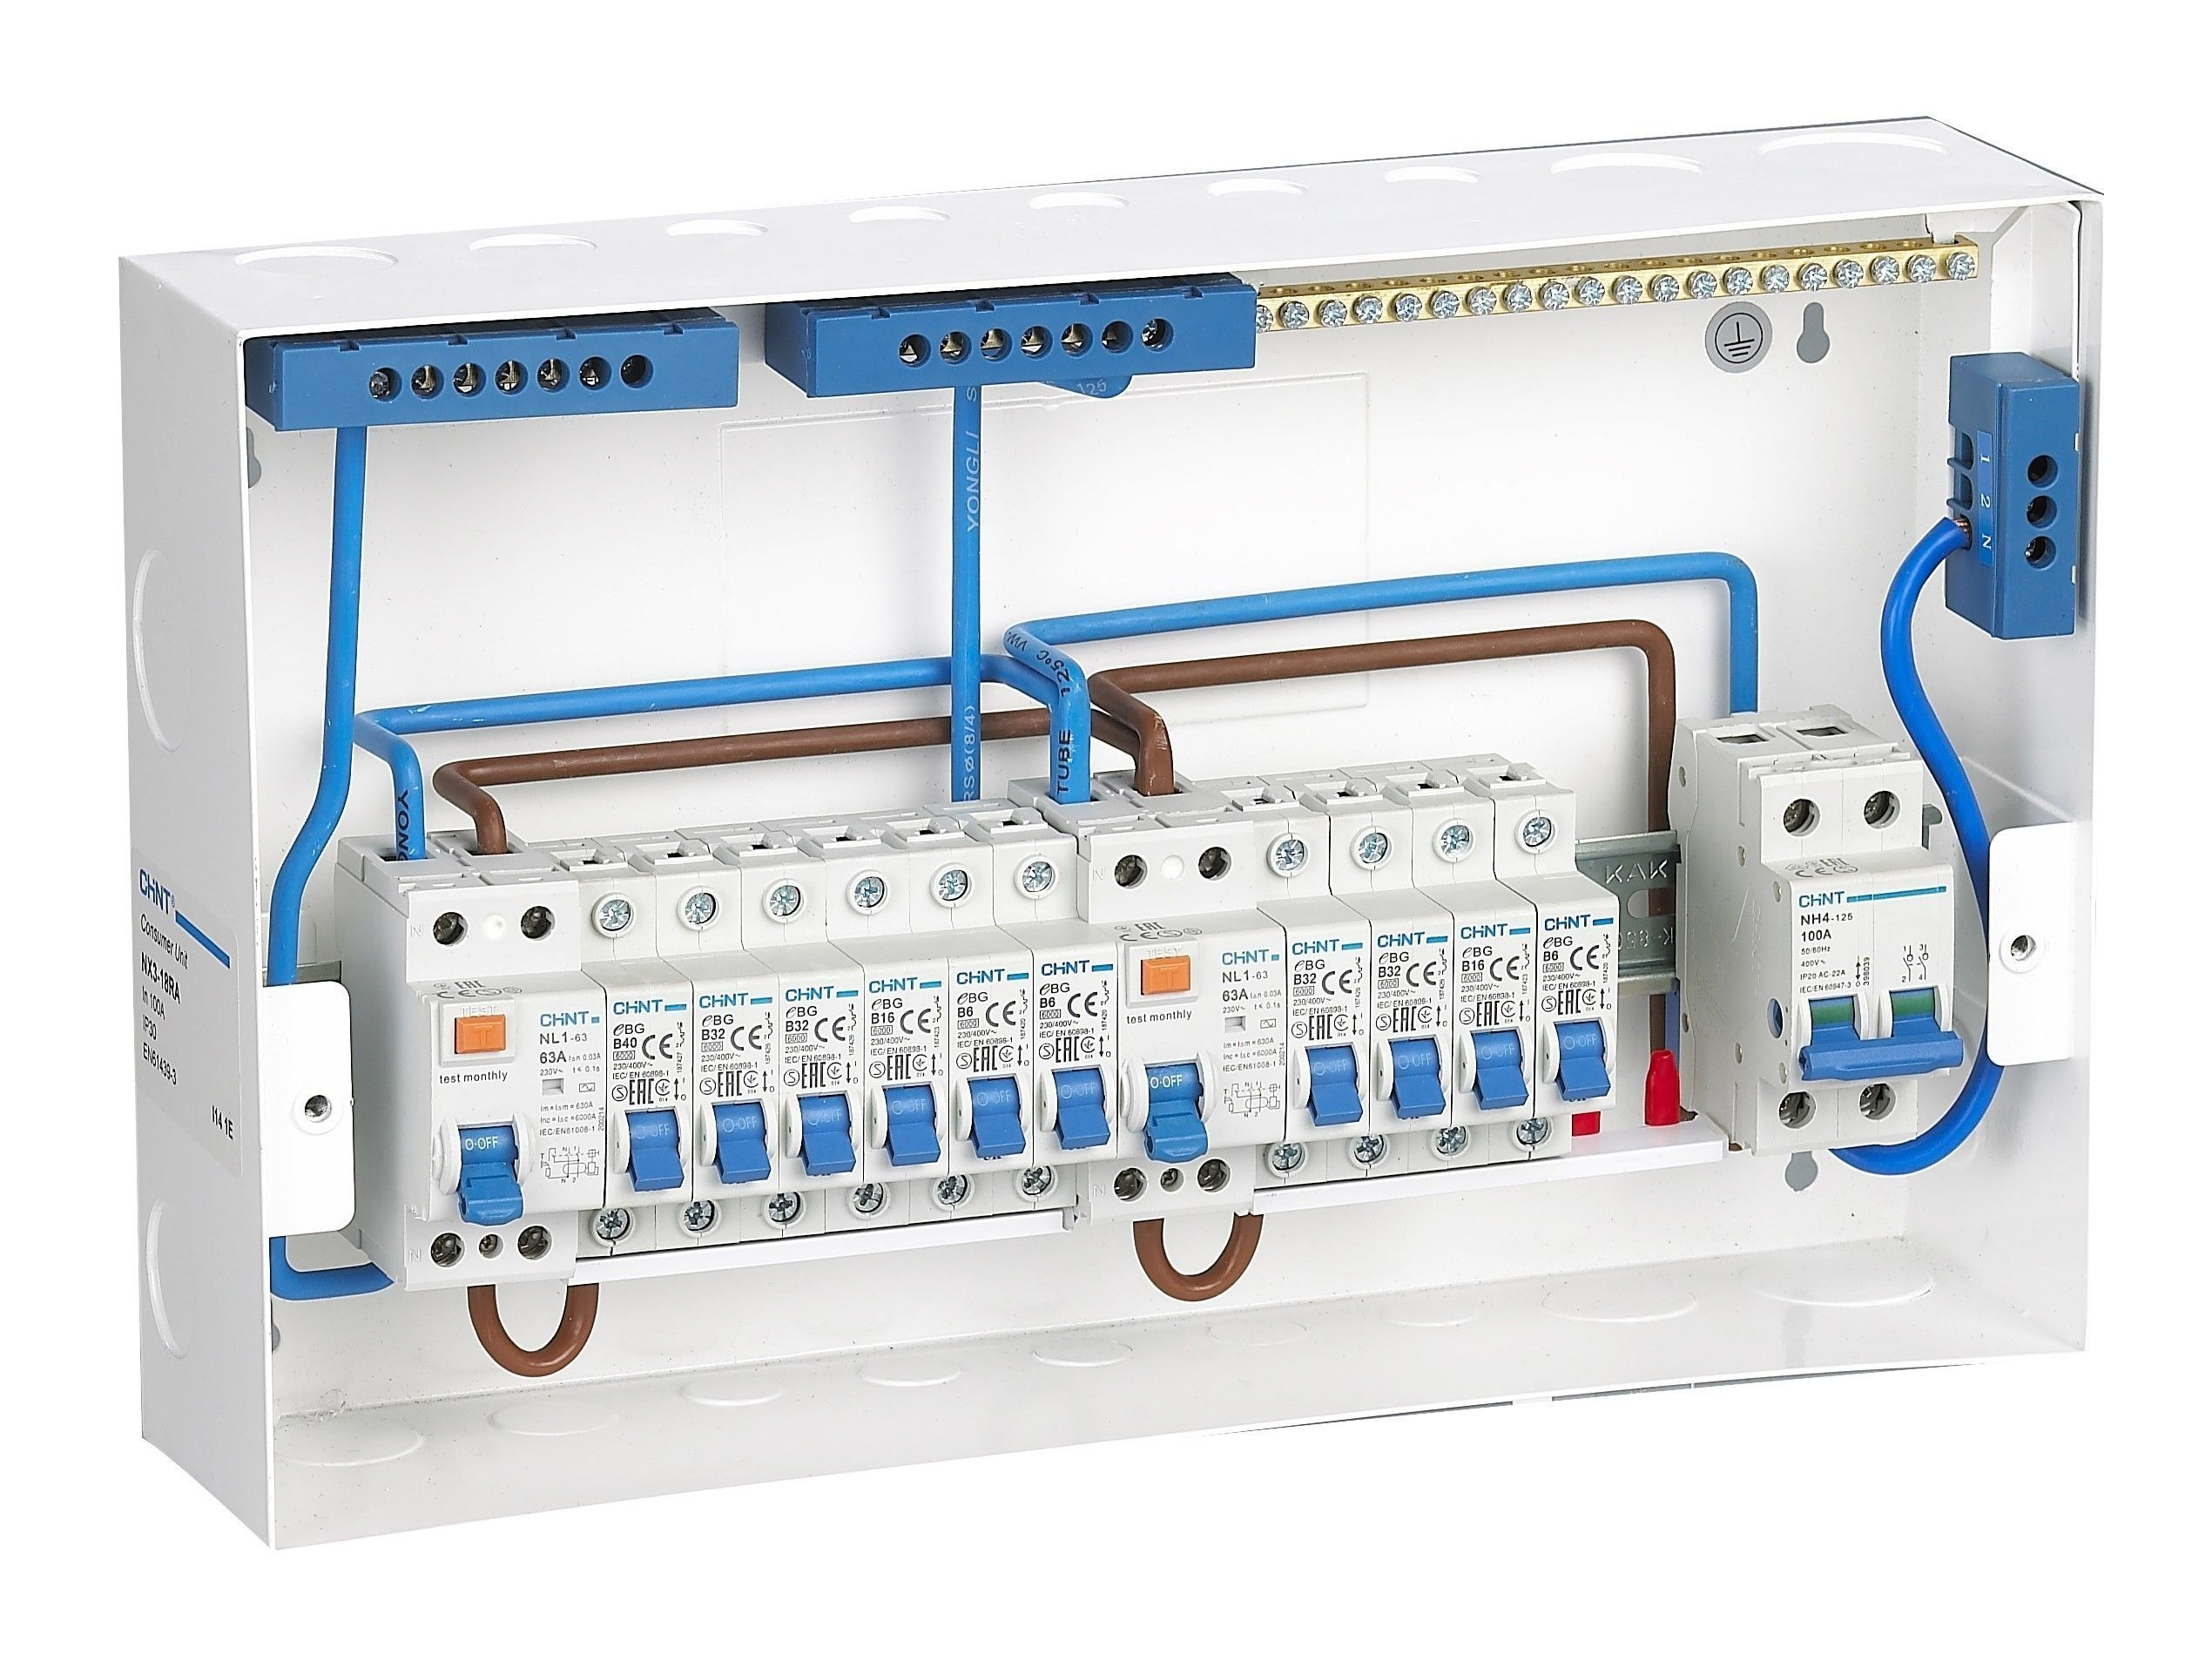 New Wiring Diagram Dual Rcd Consumer Unit Diagram Diagramtemplate Diagramsample Check More At Https Servisi Co Wiring Dia The Unit Electrical Plan Diagram